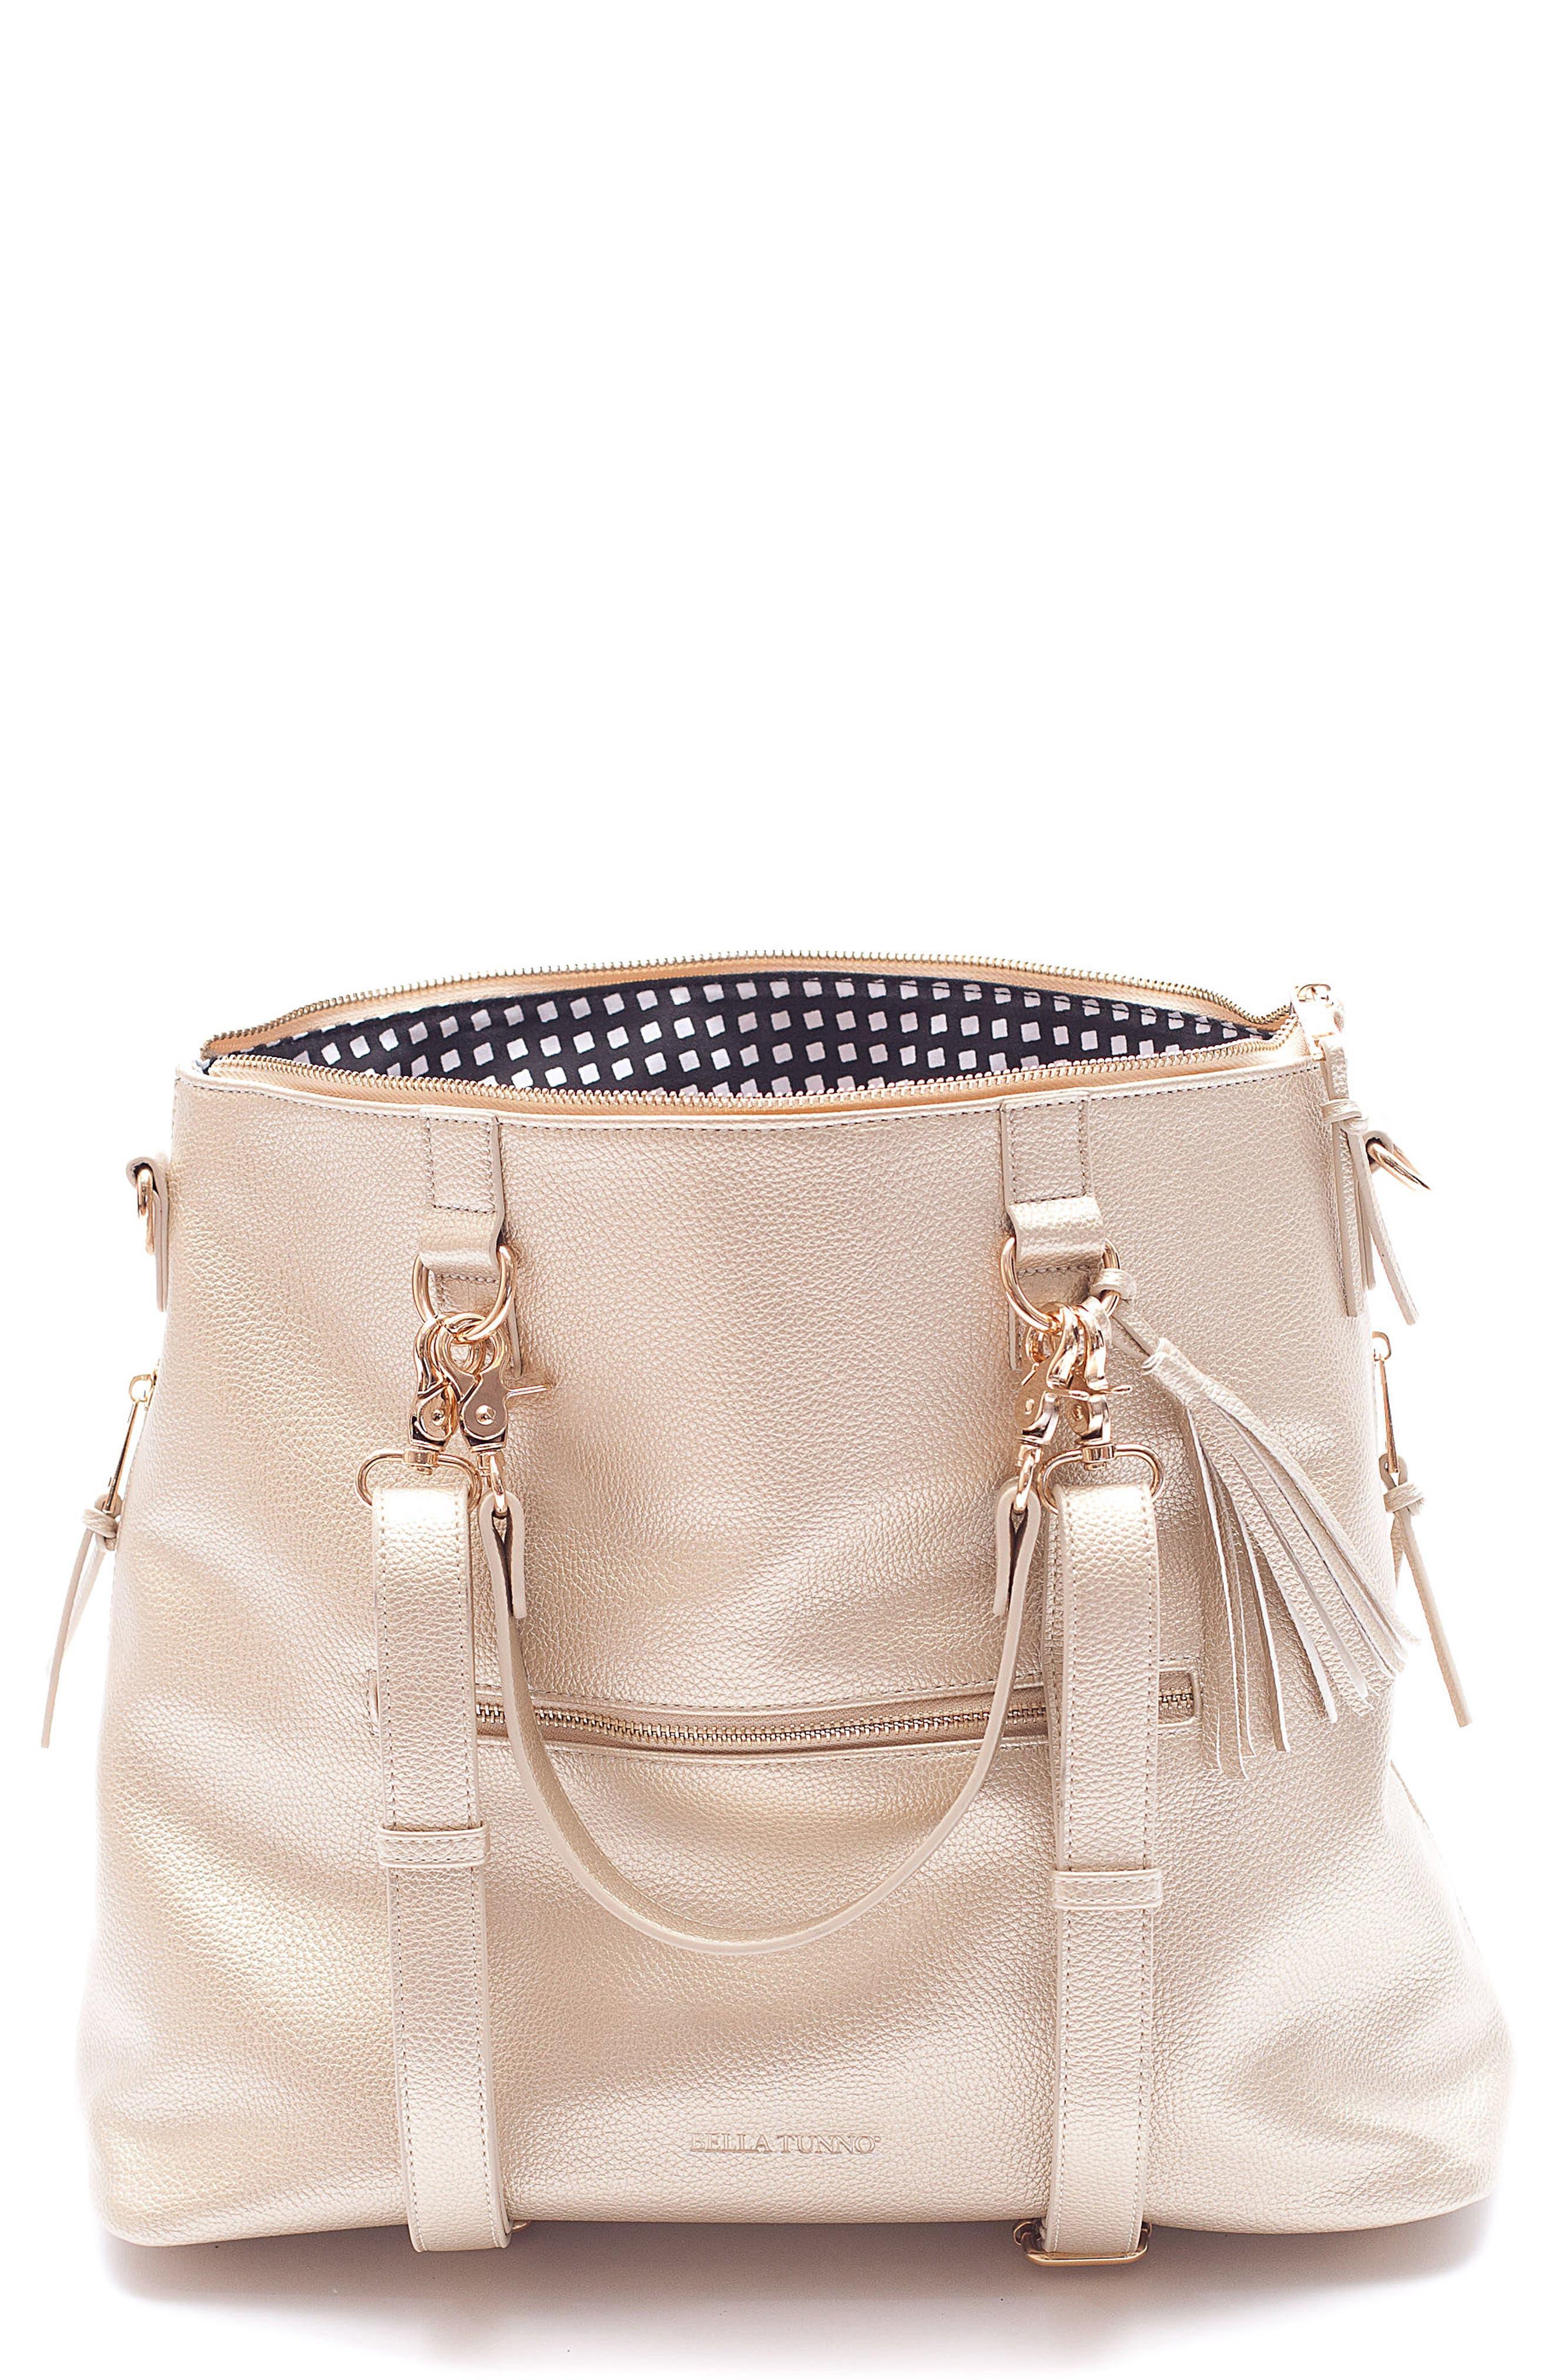 Alternate Image 1 Selected - Bella Tunno Boss Convertible Diaper Backpack